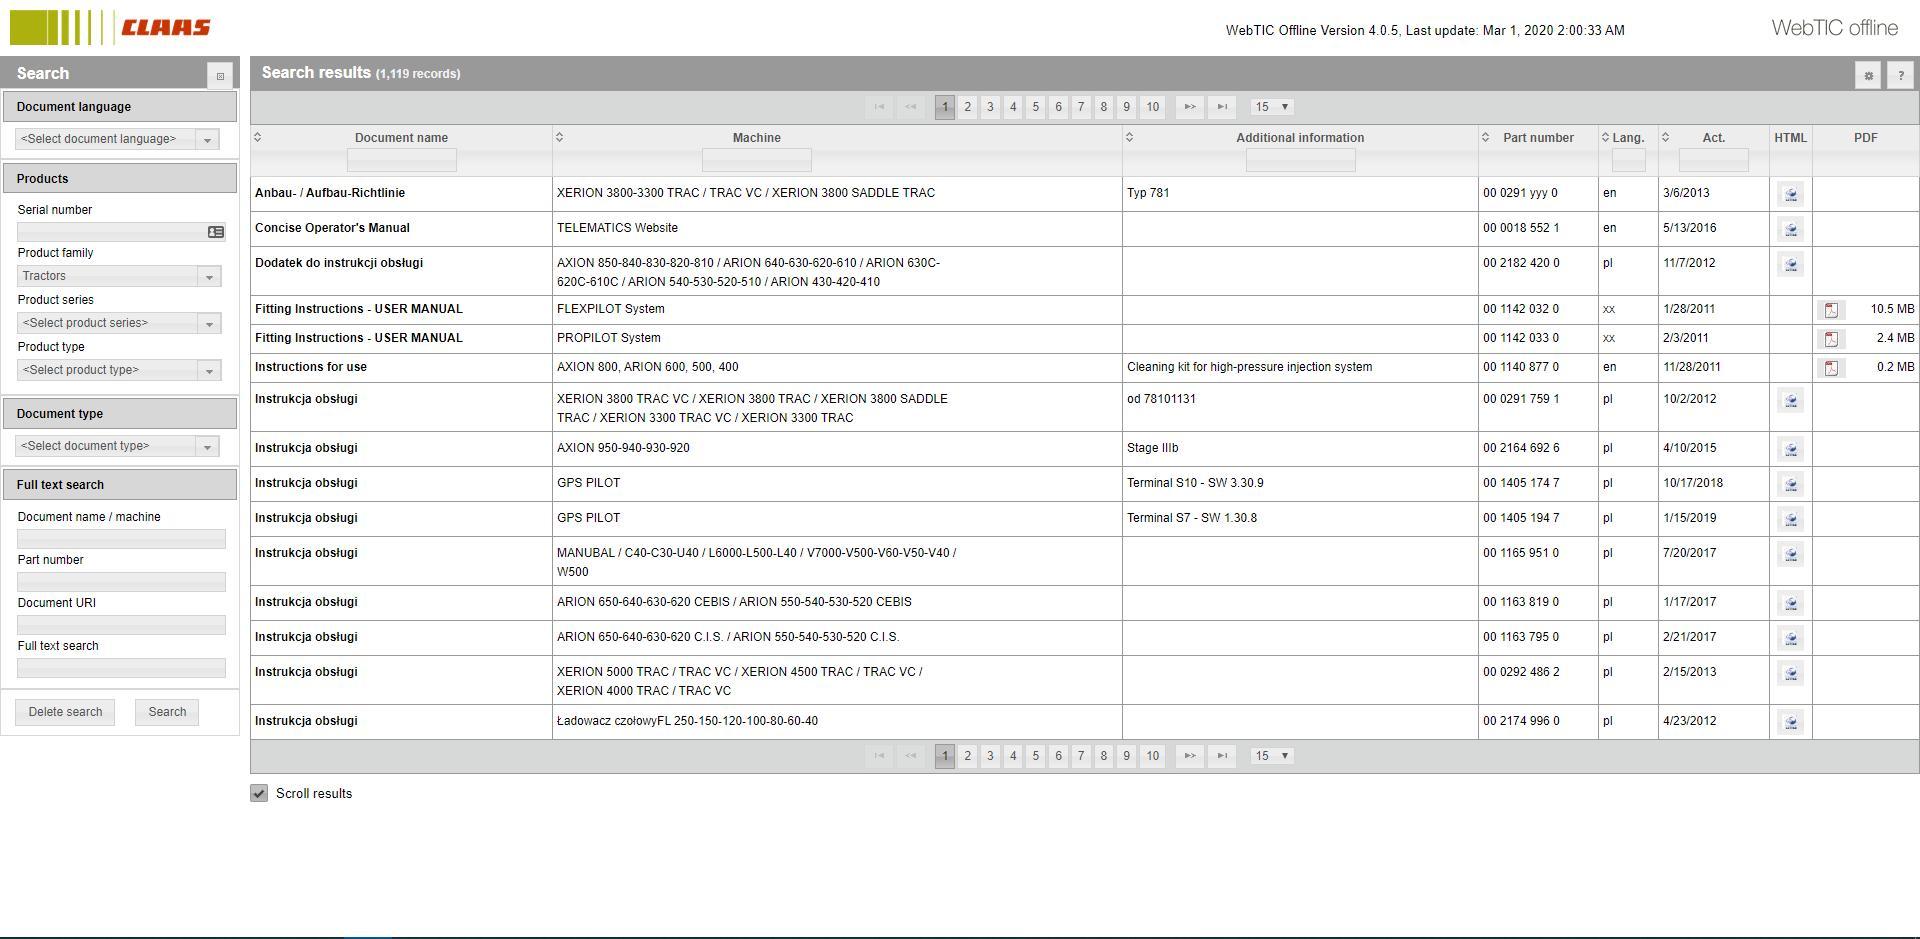 CLAASWebTICOffline2020RepairandServiceDocumentation2